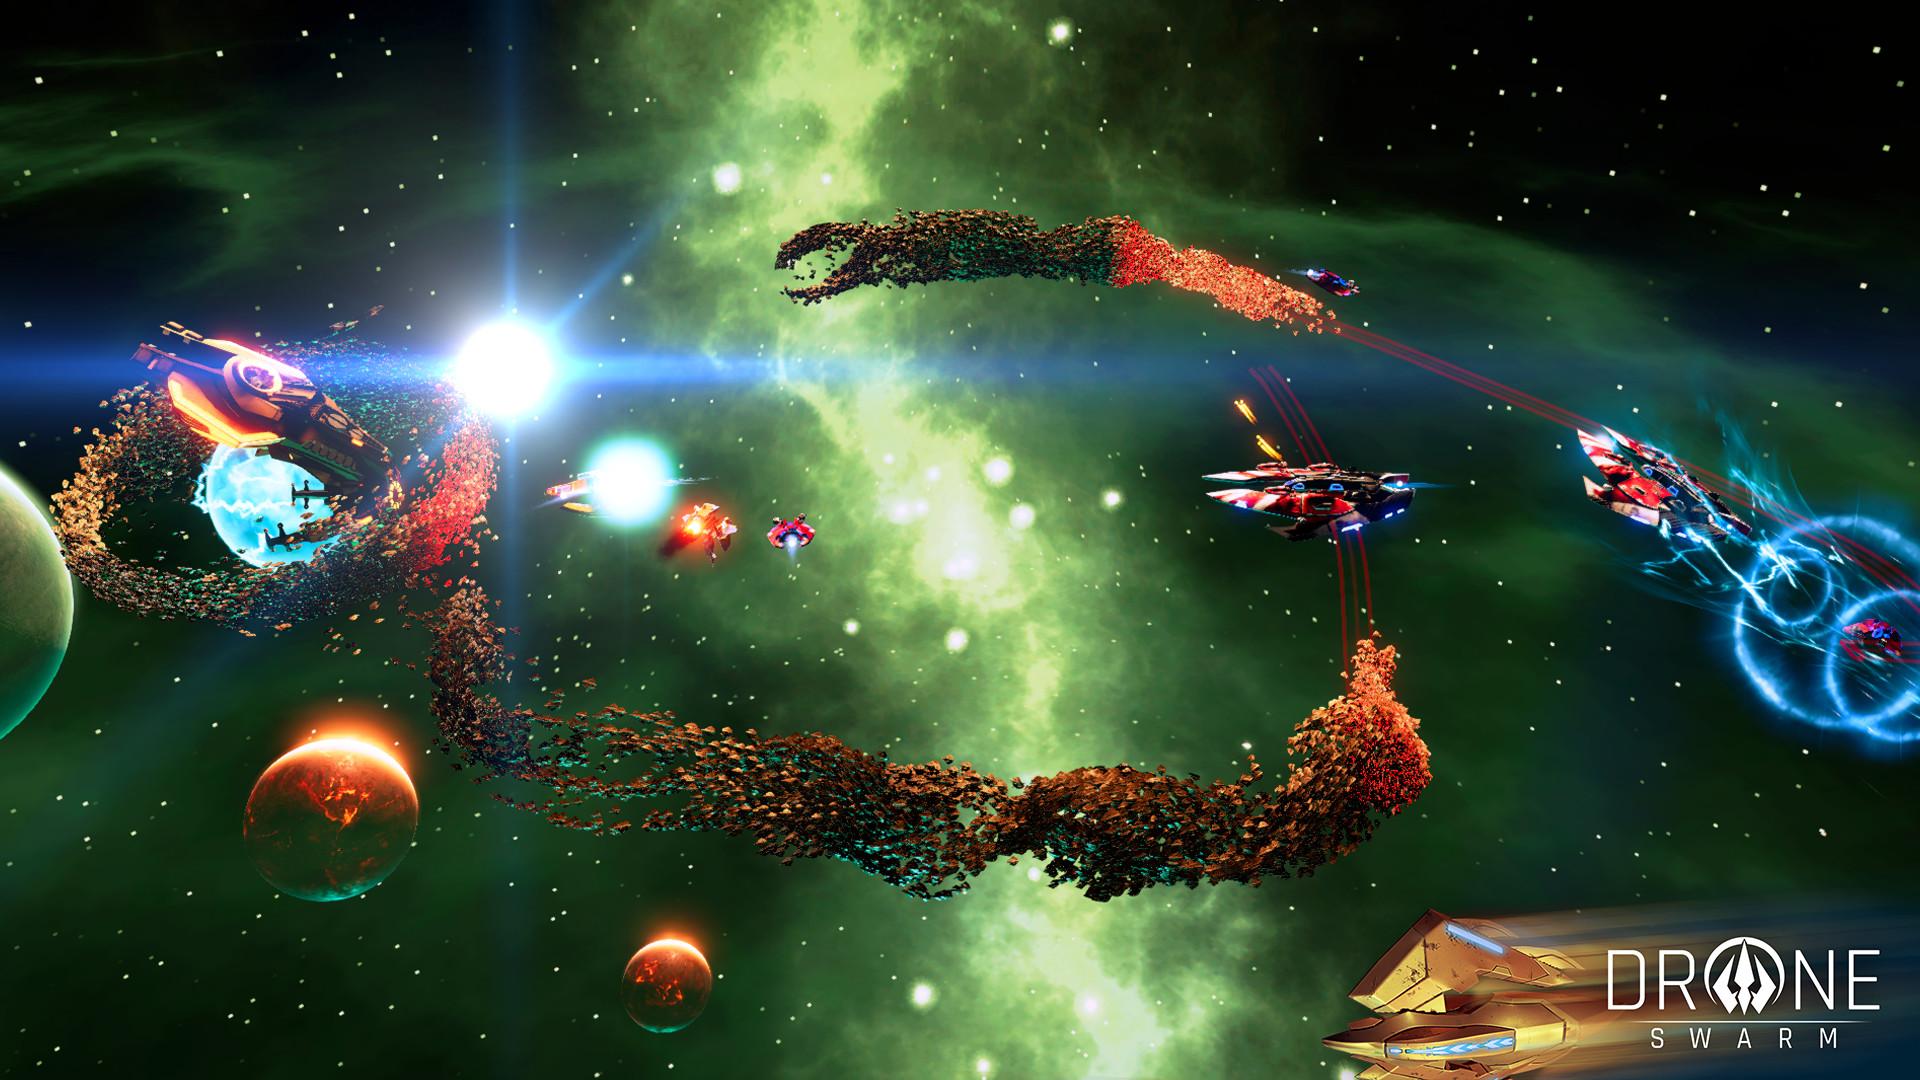 Drone Swarm screenshot